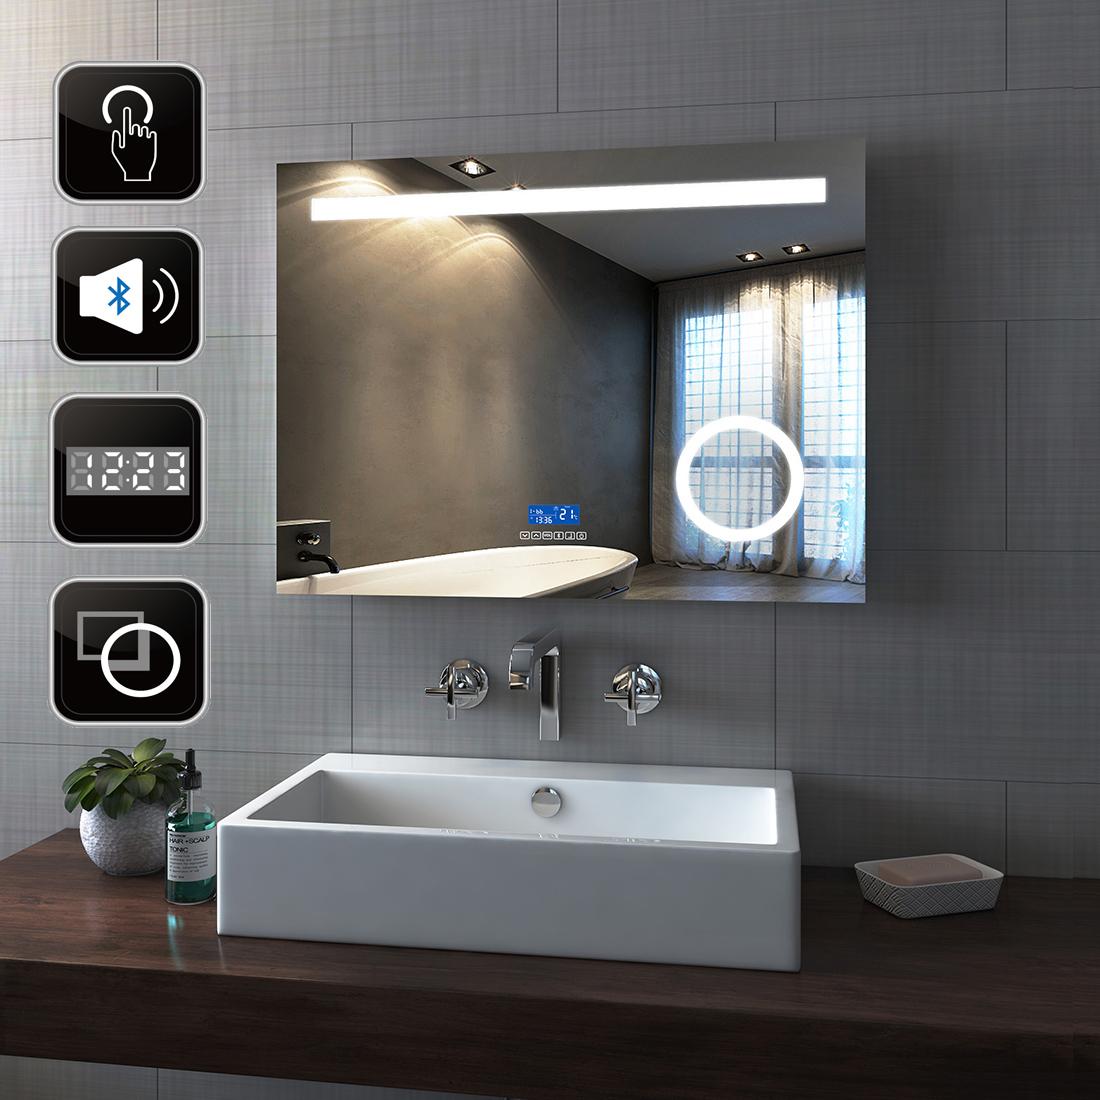 bathroom mirror with bluetooth speaker